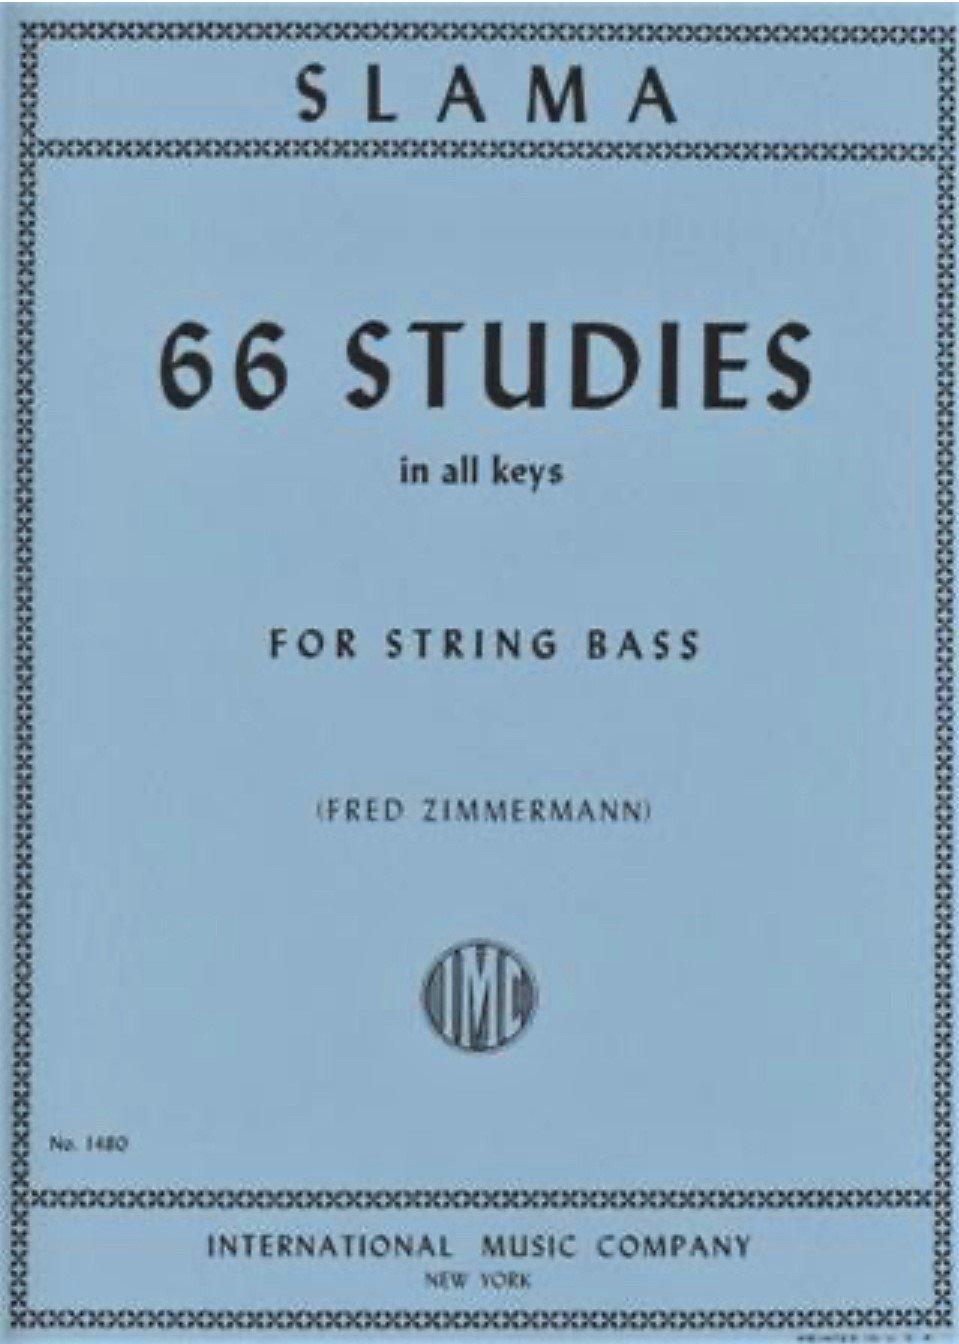 66 Studies - Slama - Bass - Zimmerman - International